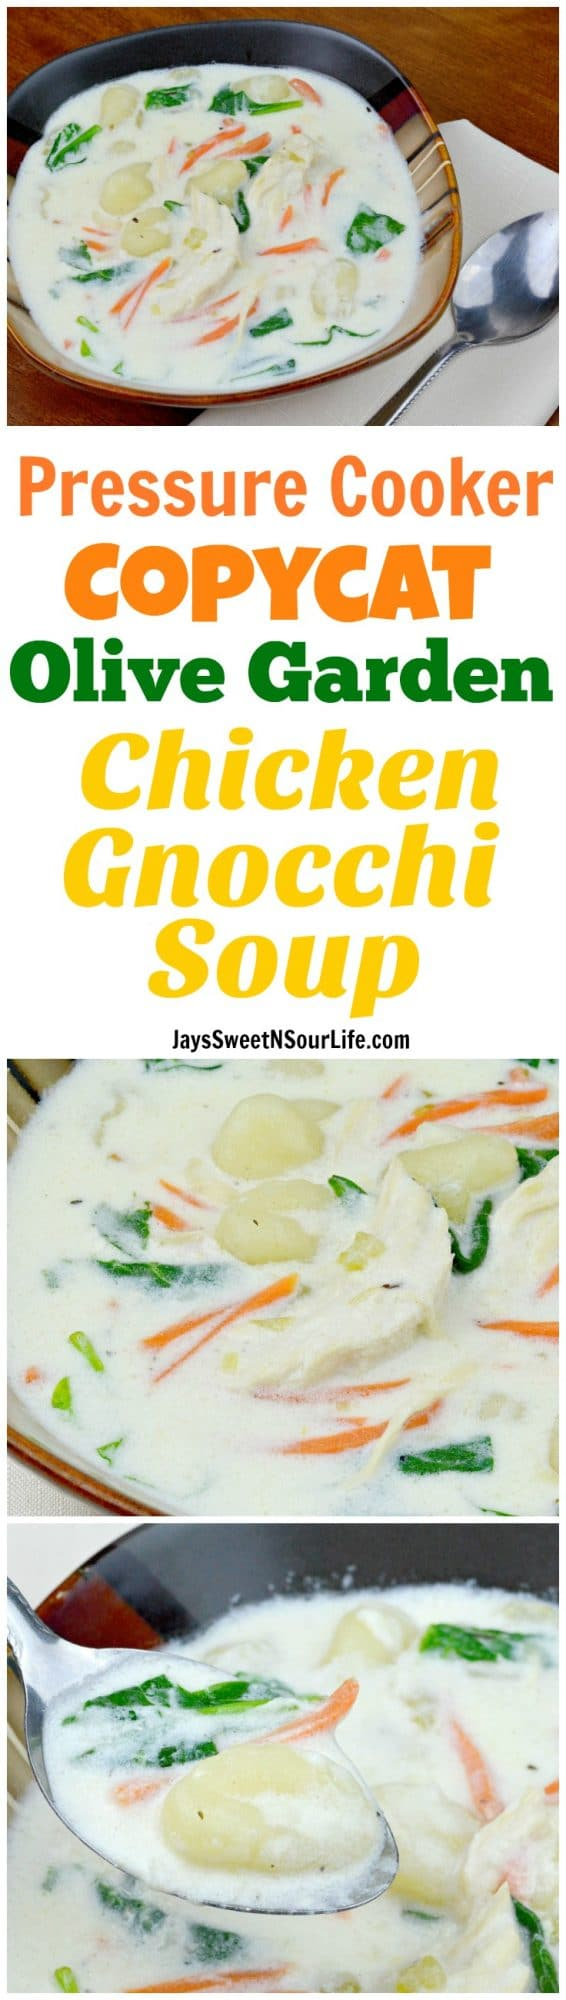 Pressure cooker copycat olive garden chicken gnocchi soup jays sweet n sour life for Copycat olive garden chicken gnocchi soup